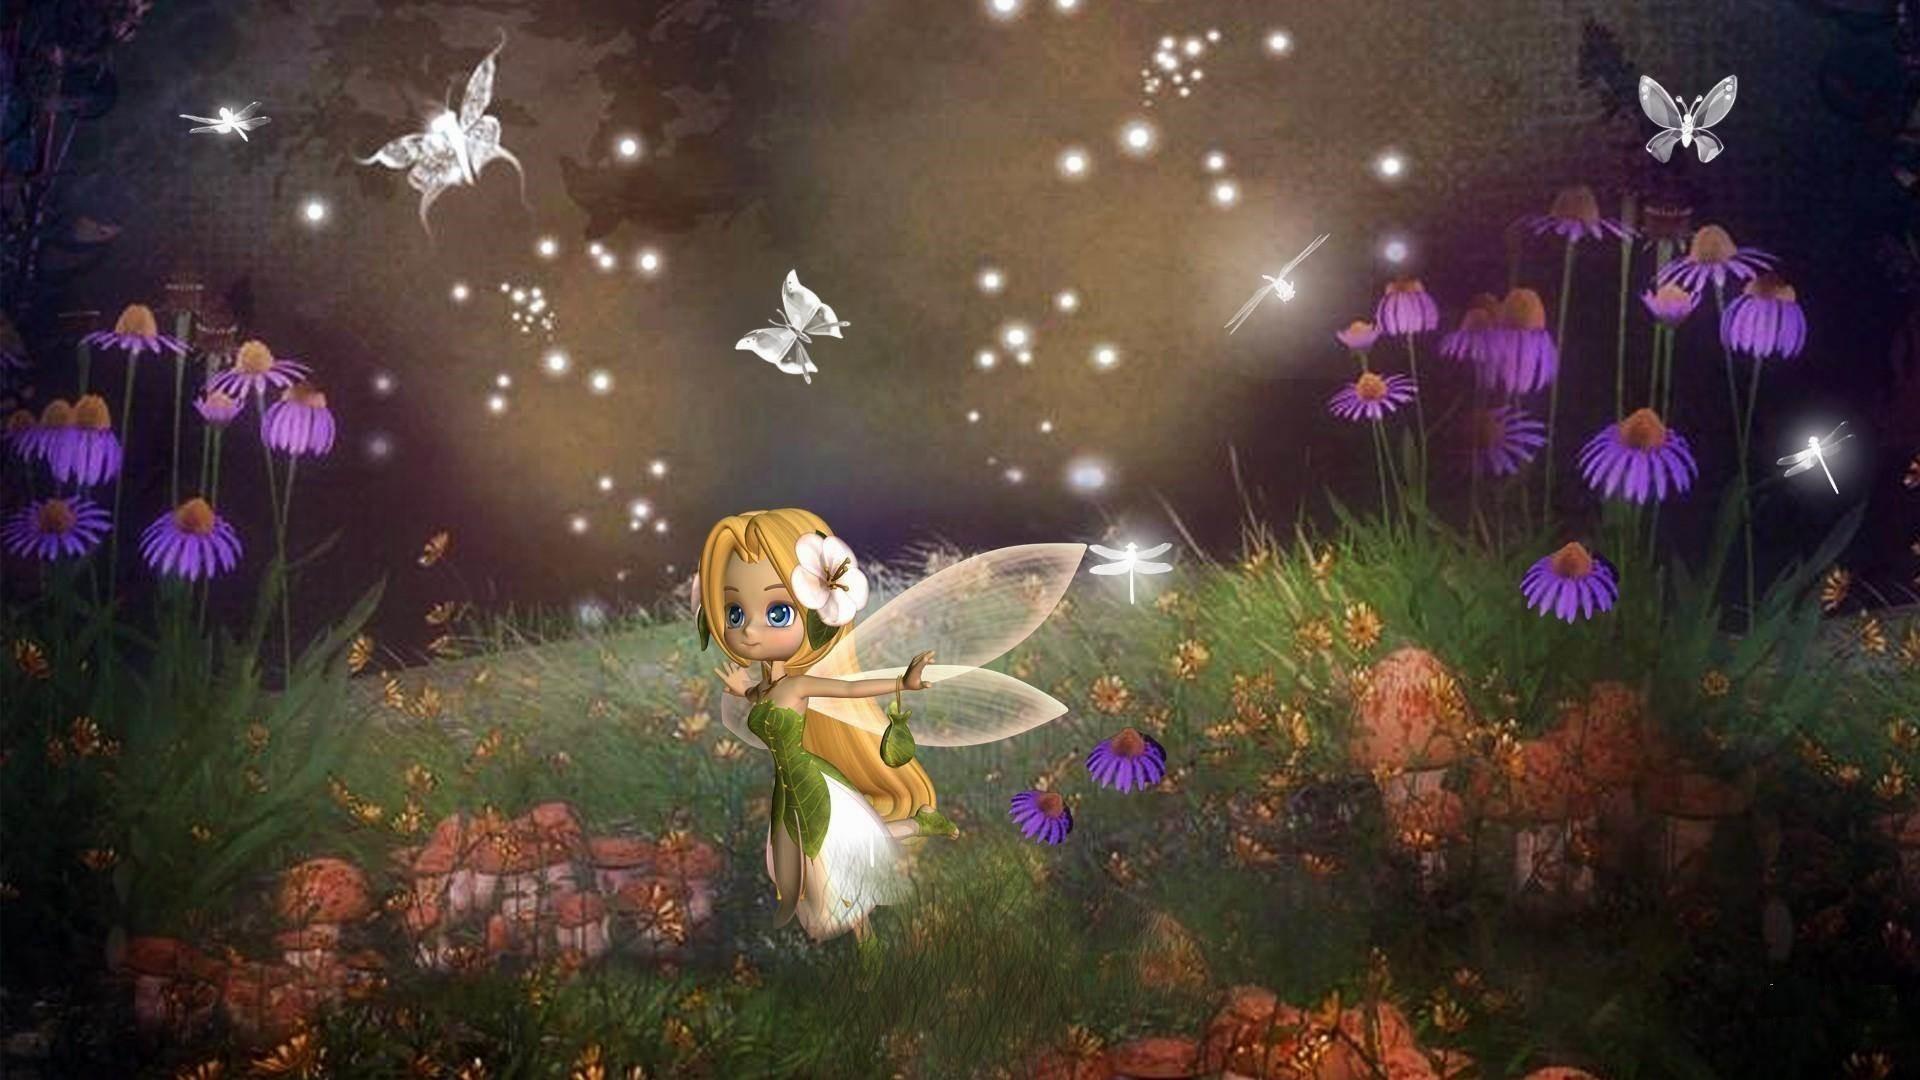 Fairy Wallpaper 1920×1080